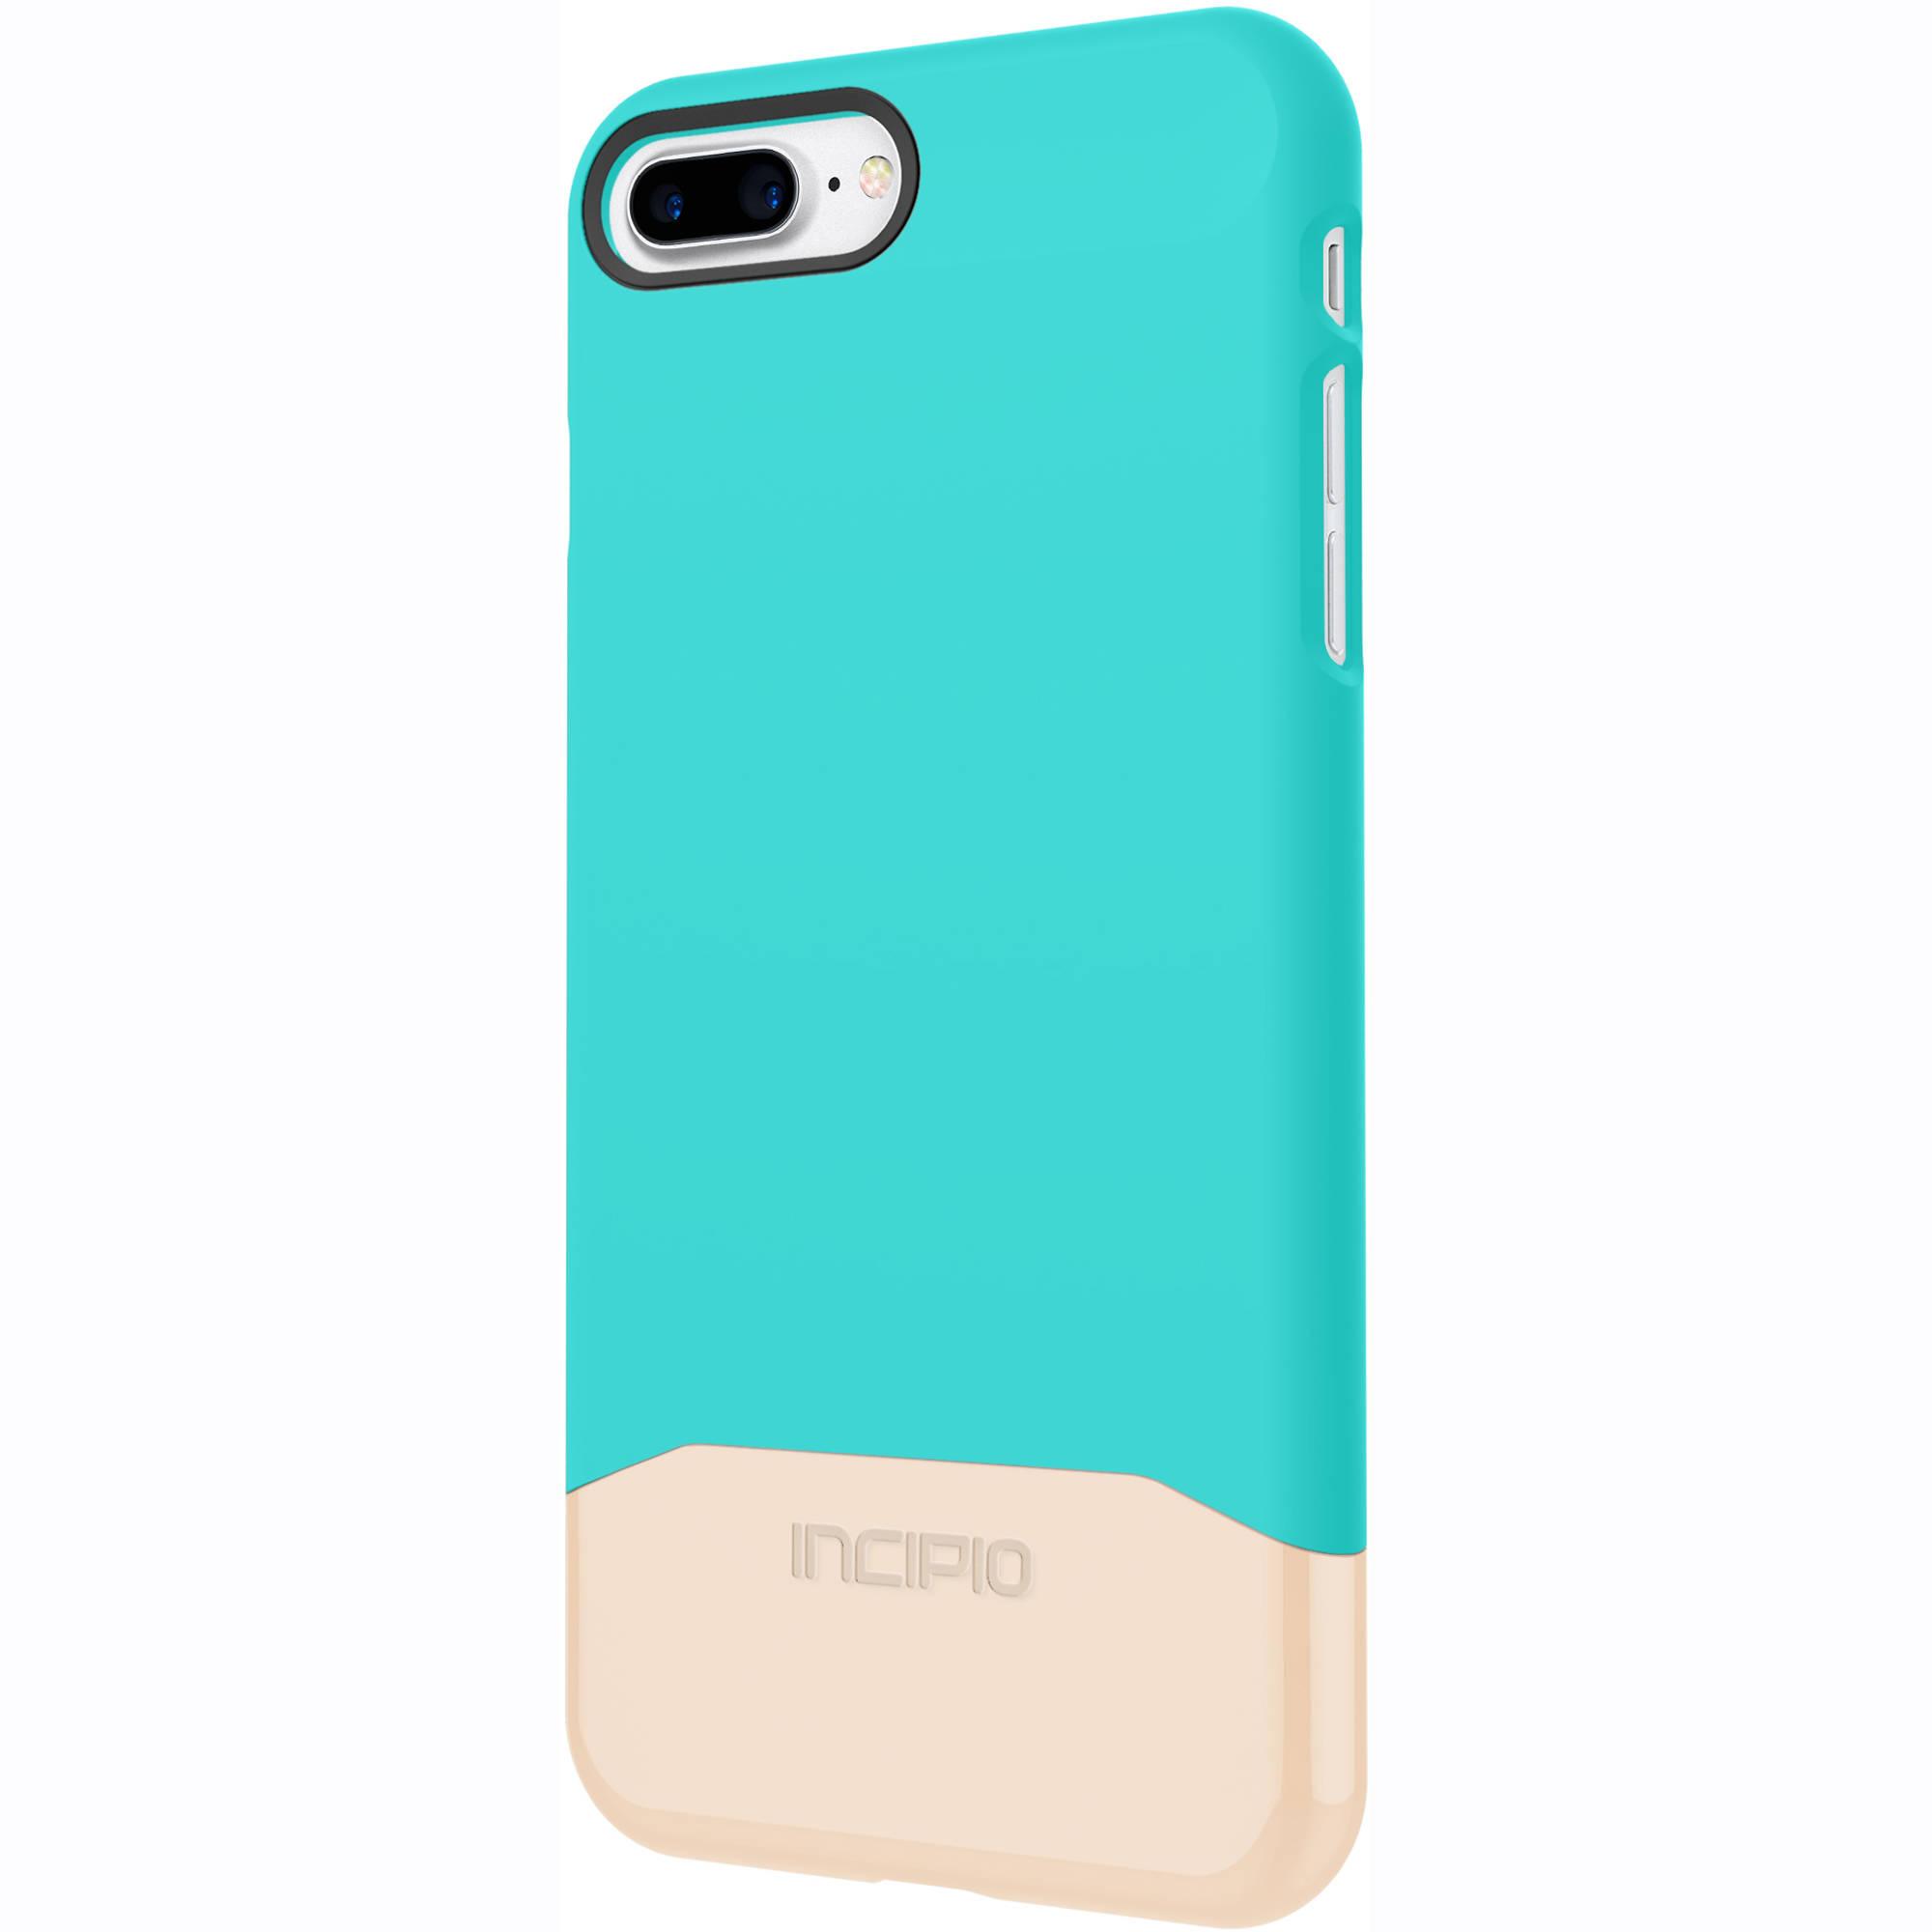 premium selection 0f208 5311e Incipio Edge Chrome Case for iPhone 7 Plus (Turquoise/Champagne Chrome)